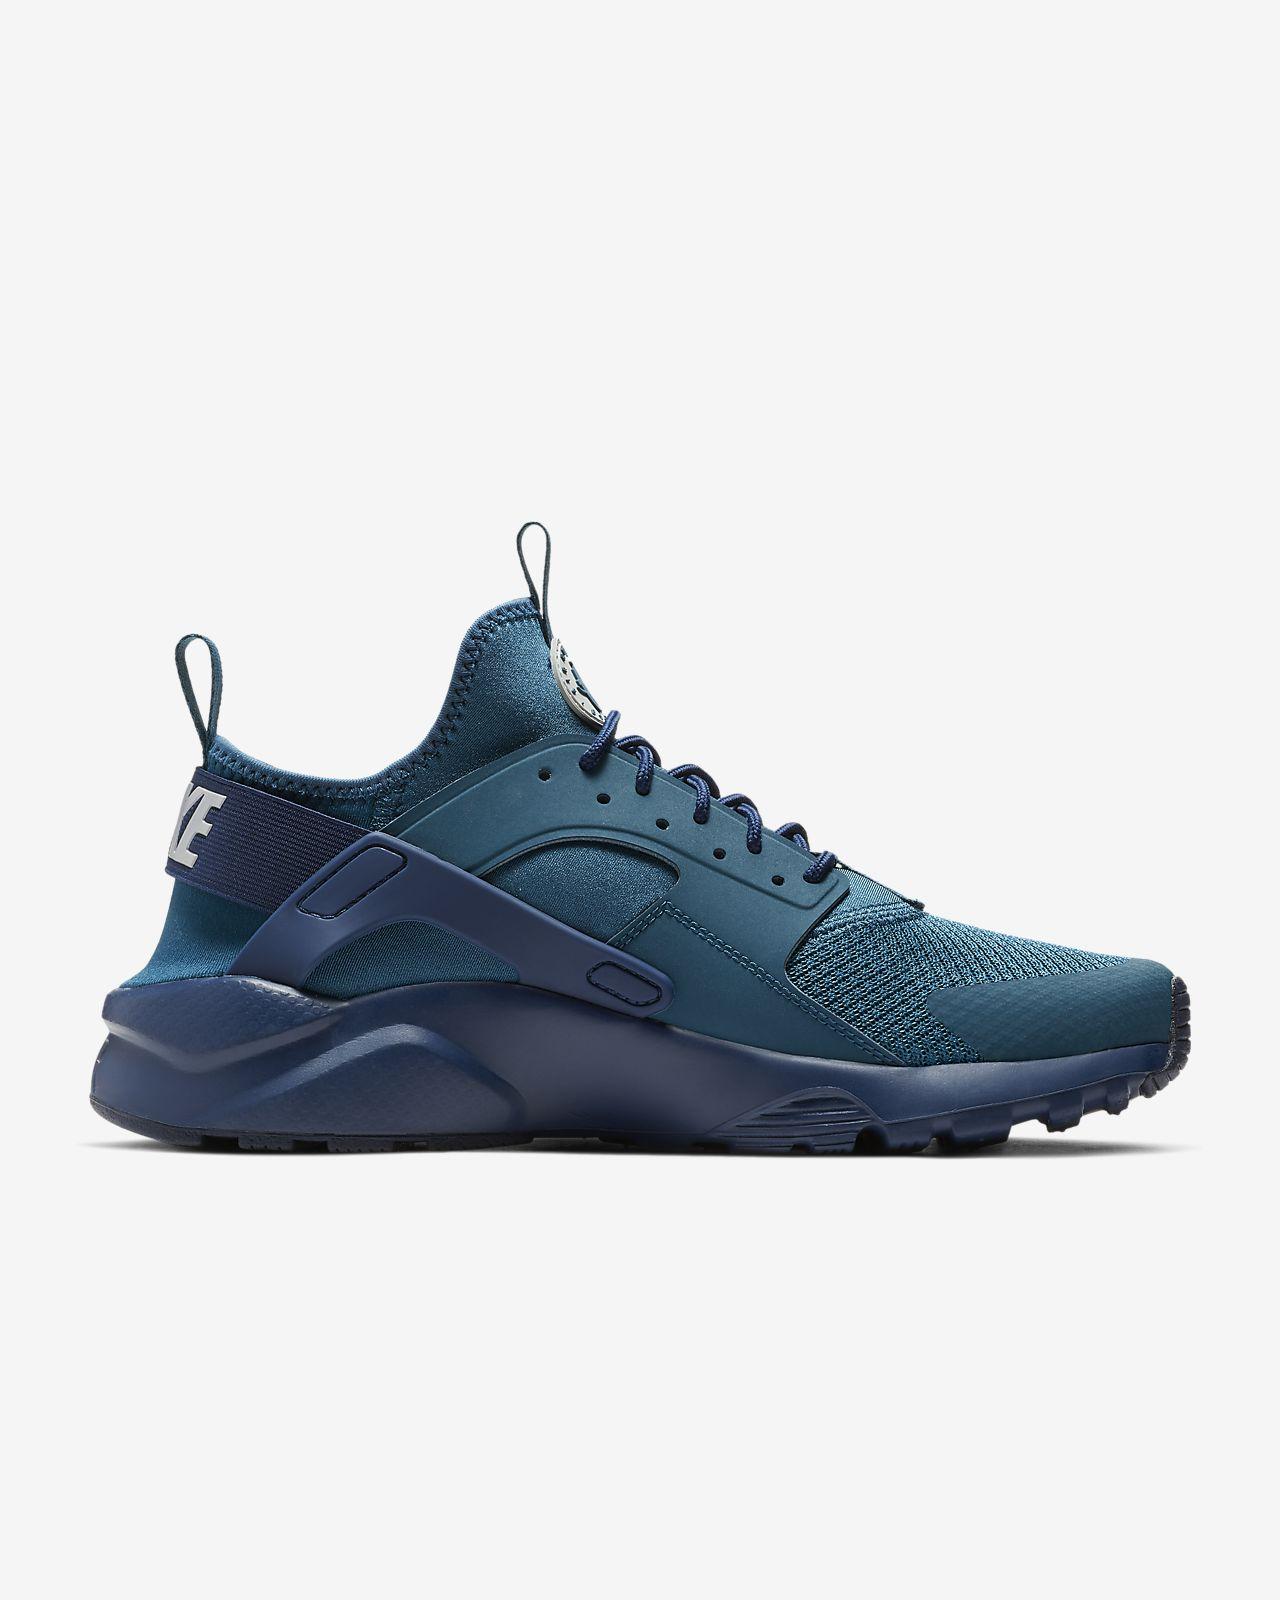 hot sale online 2155f 598c7 ... Nike Air Huarache Ultra Men s Shoe